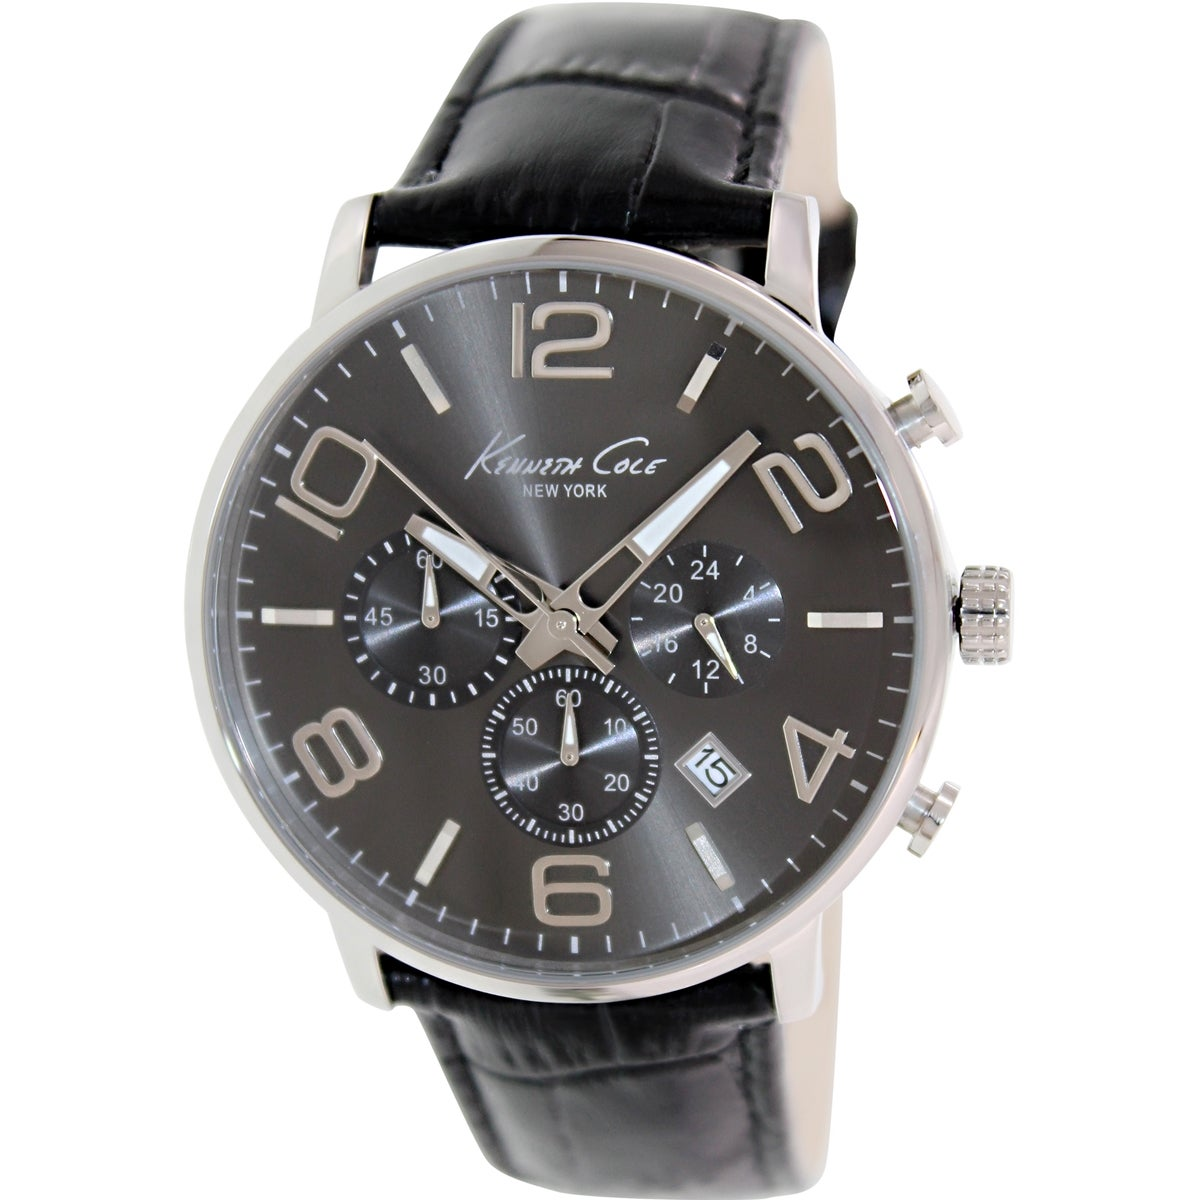 Kenneth Cole Men's KC8007 Black Leather Quartz Watch with Grey Dial